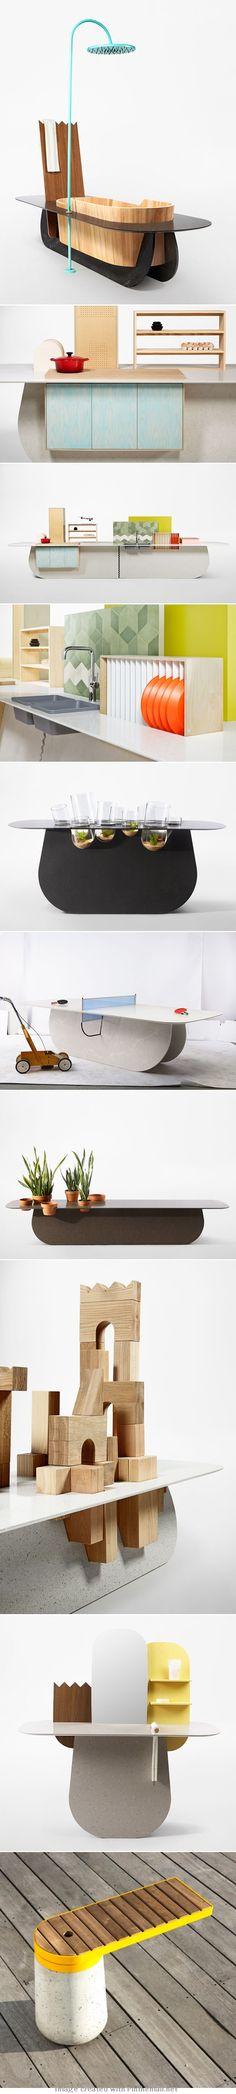 Compact furniture via RawEdges